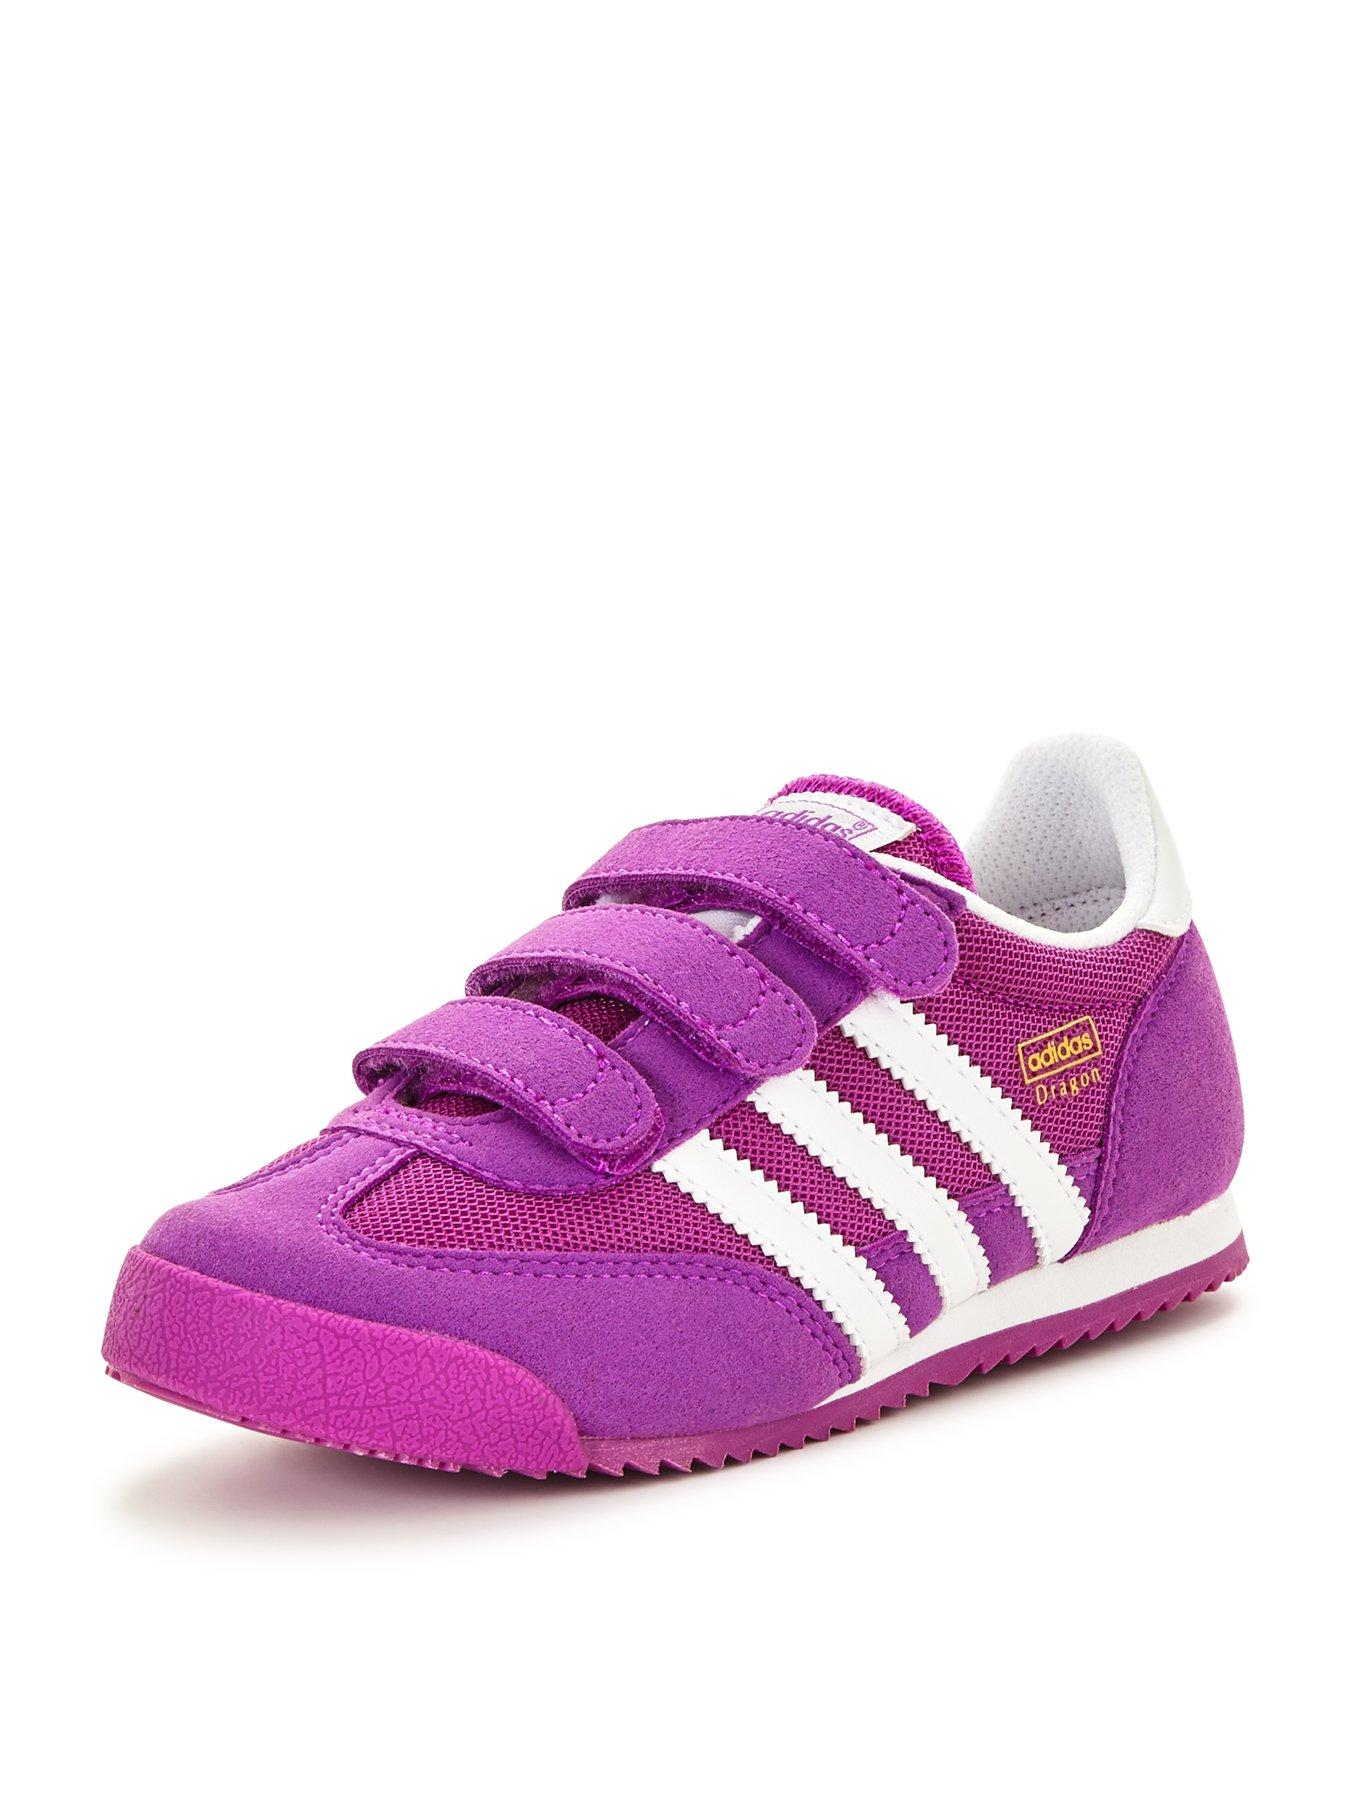 adidas originals star wars 2 kids purple